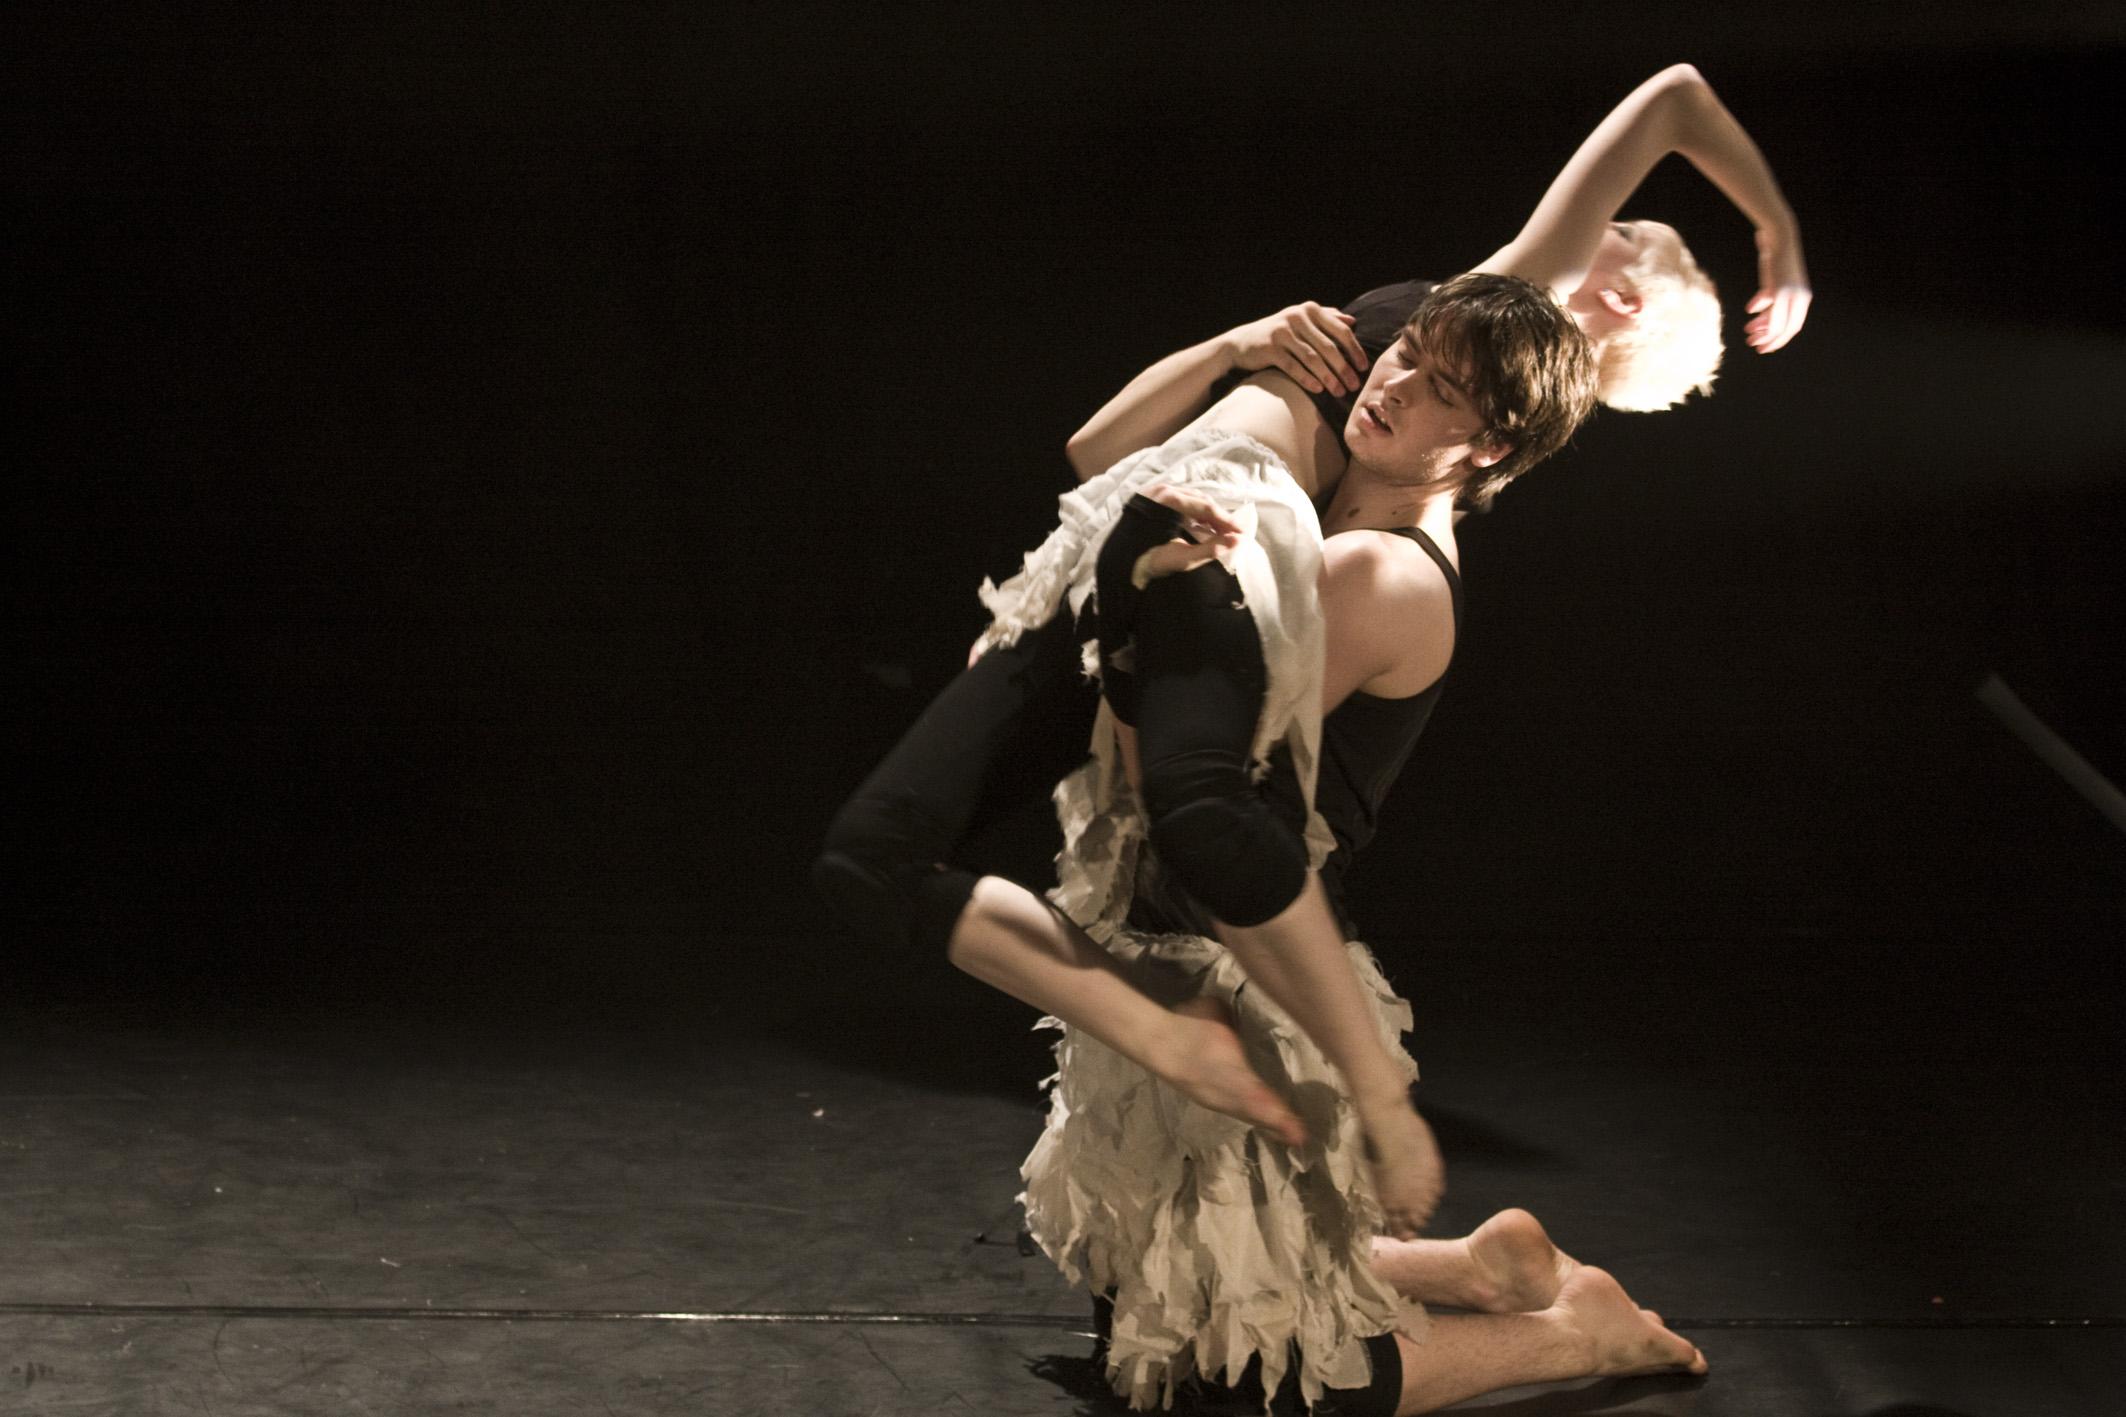 http://www.danceahead.co.uk/wp-content/uploads/2018/05/ATBOR13.jpg